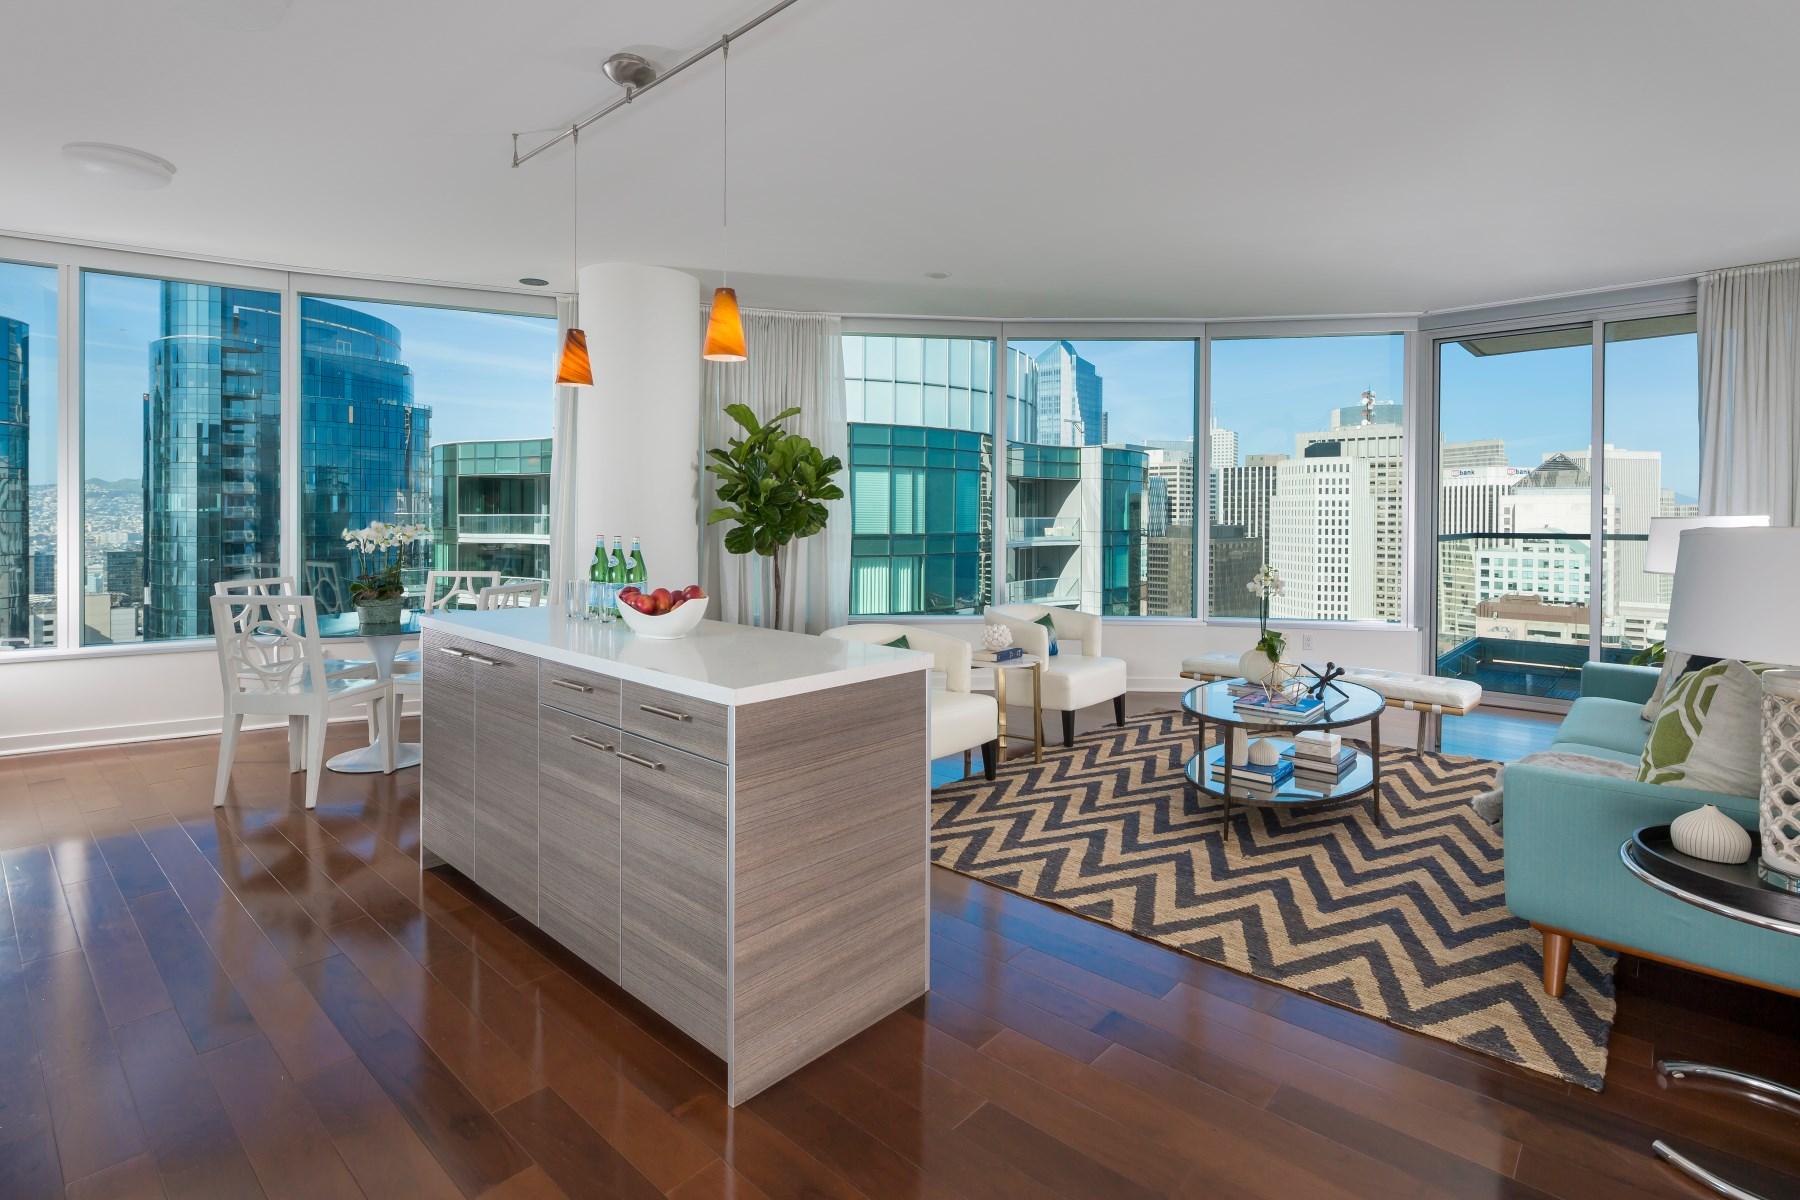 共管物業 為 出售 在 The Infinity Condo with Stunning Views 338 Spear St Unit 37F South Beach, San Francisco, 加利福尼亞州, 94105 美國